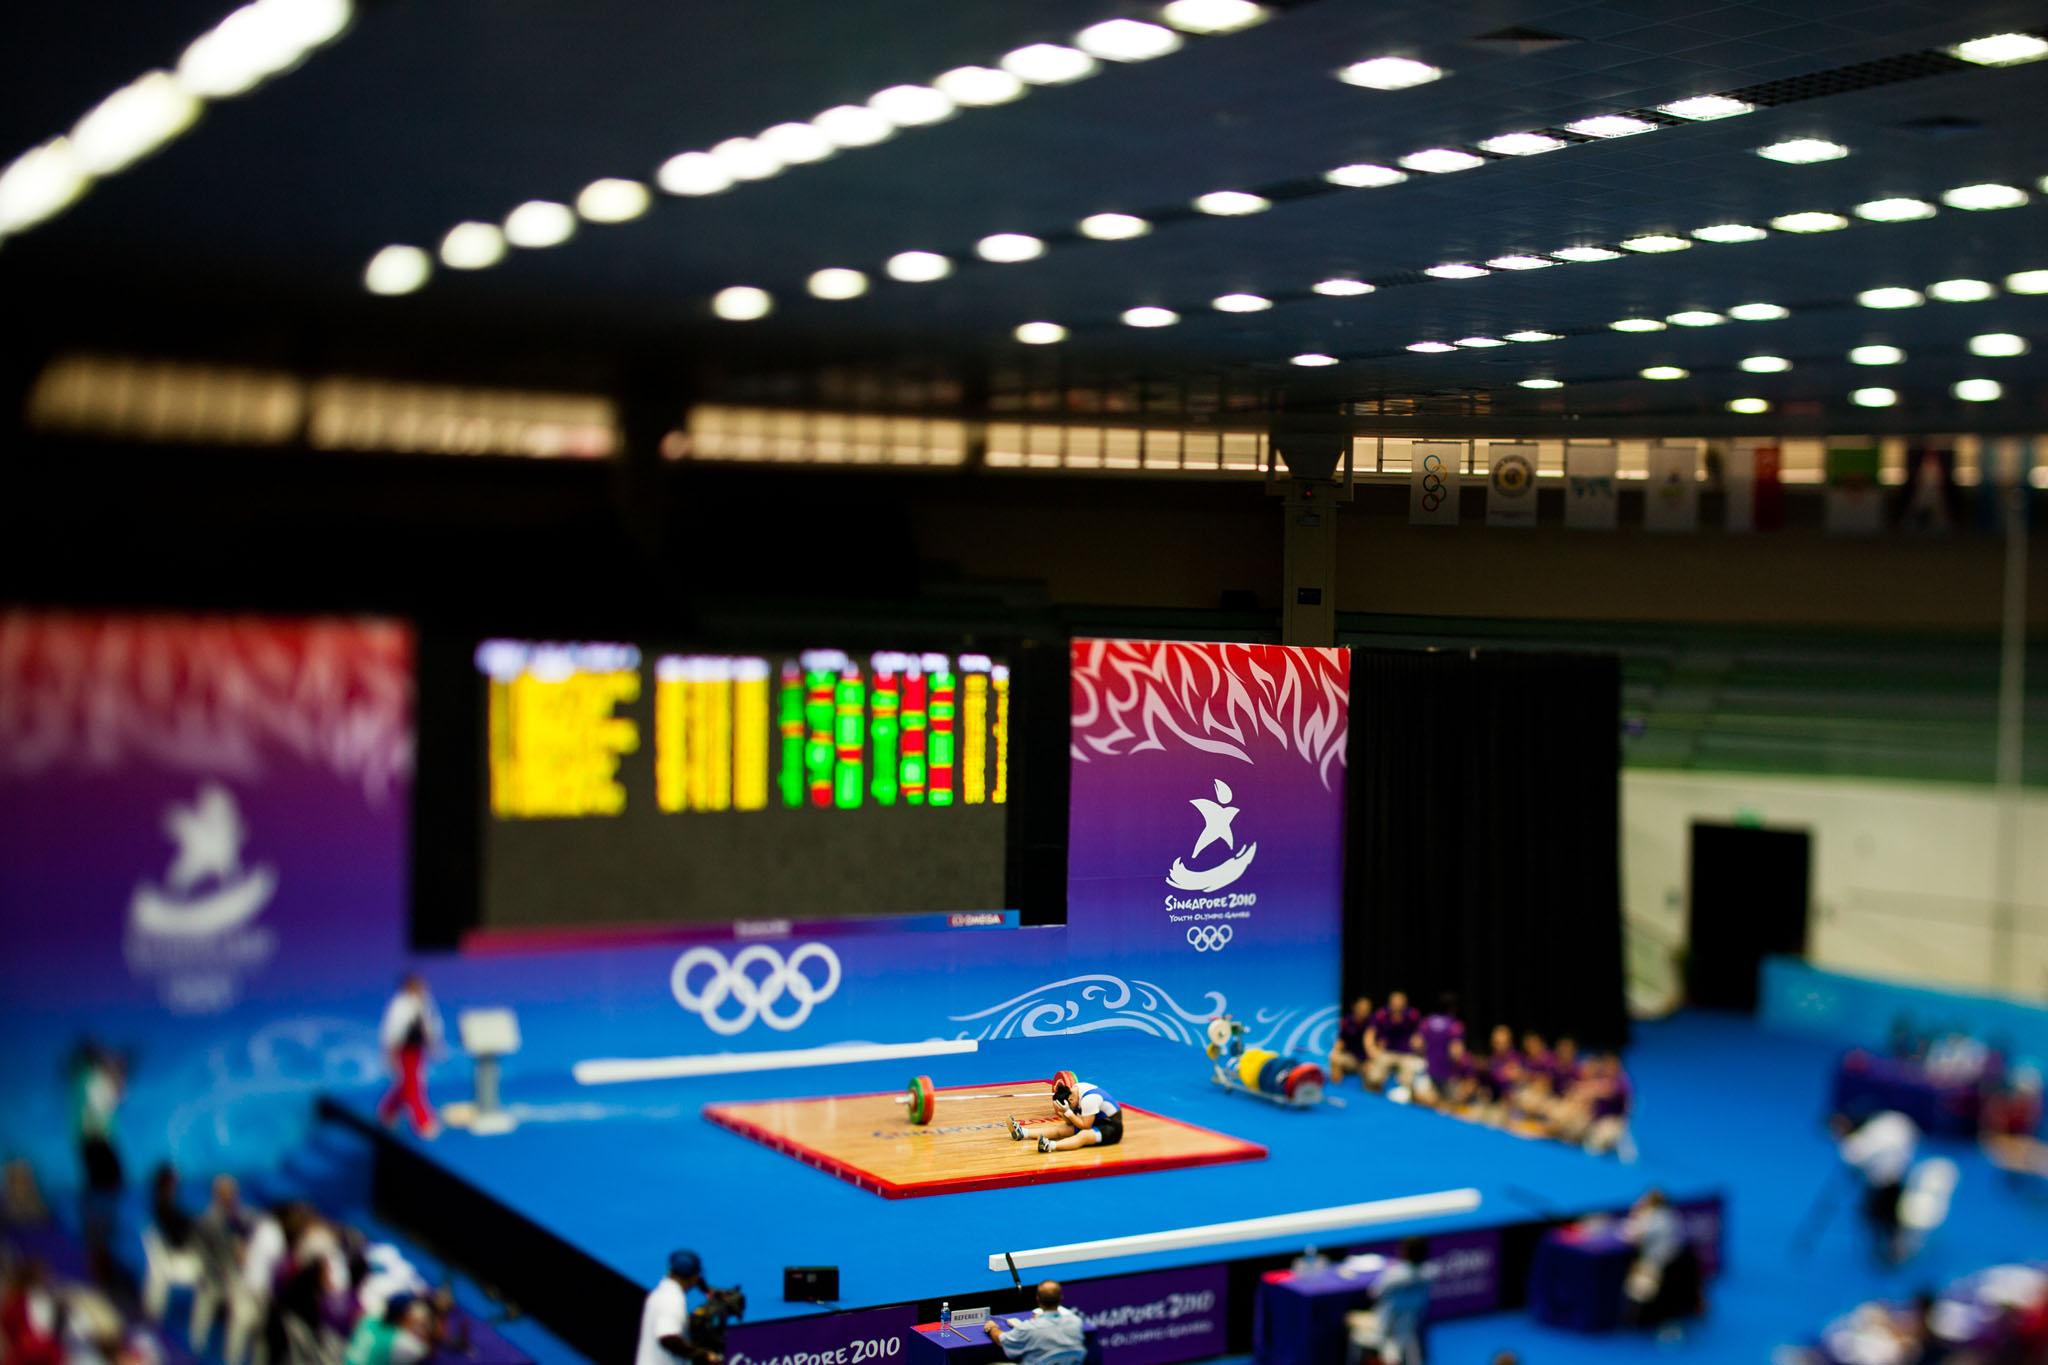 singapore-commercial-photographer-editorial-documentary-tiltshift-yog-olympic-games-olympics-zakaria-zainal-09.jpg